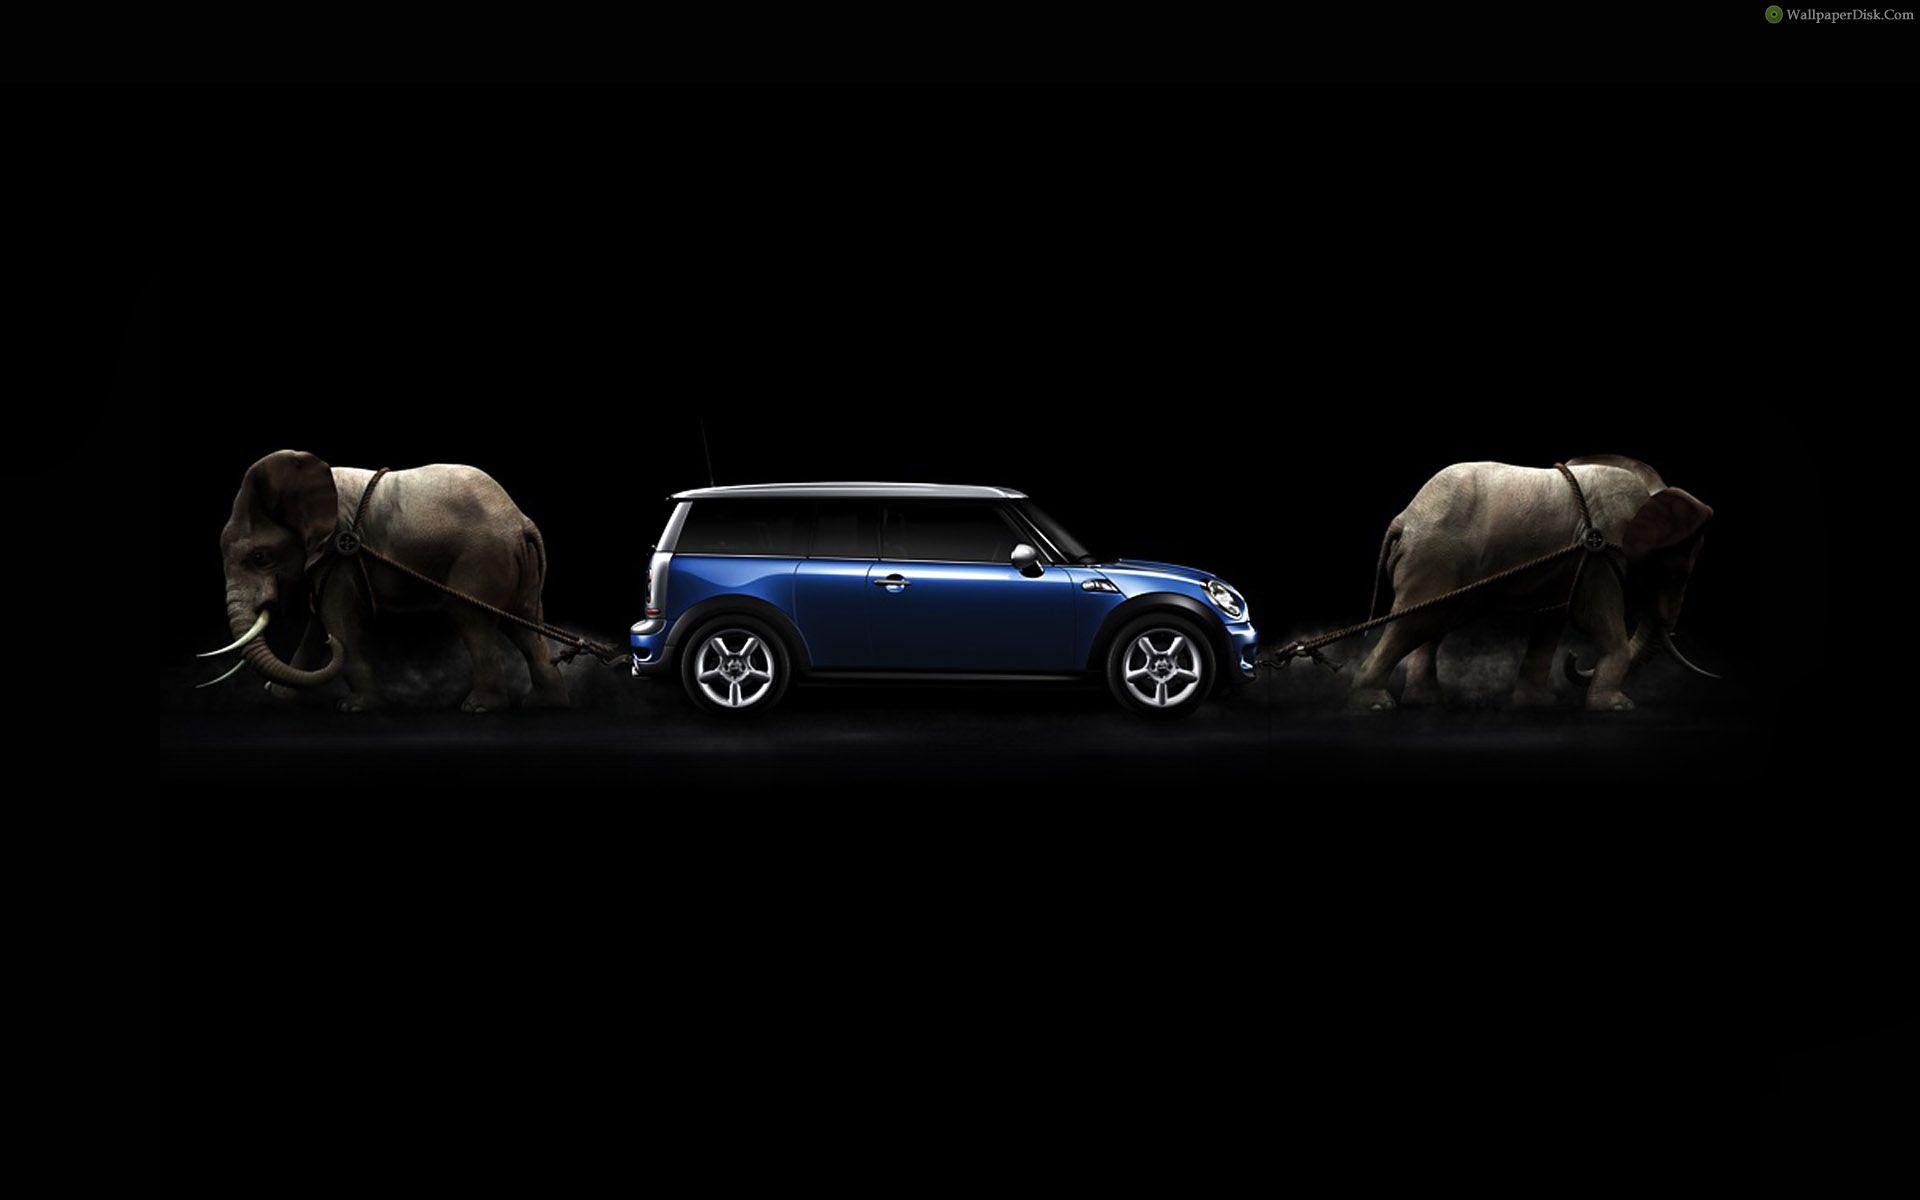 Elephant-and-Car-Wallpaper-HD